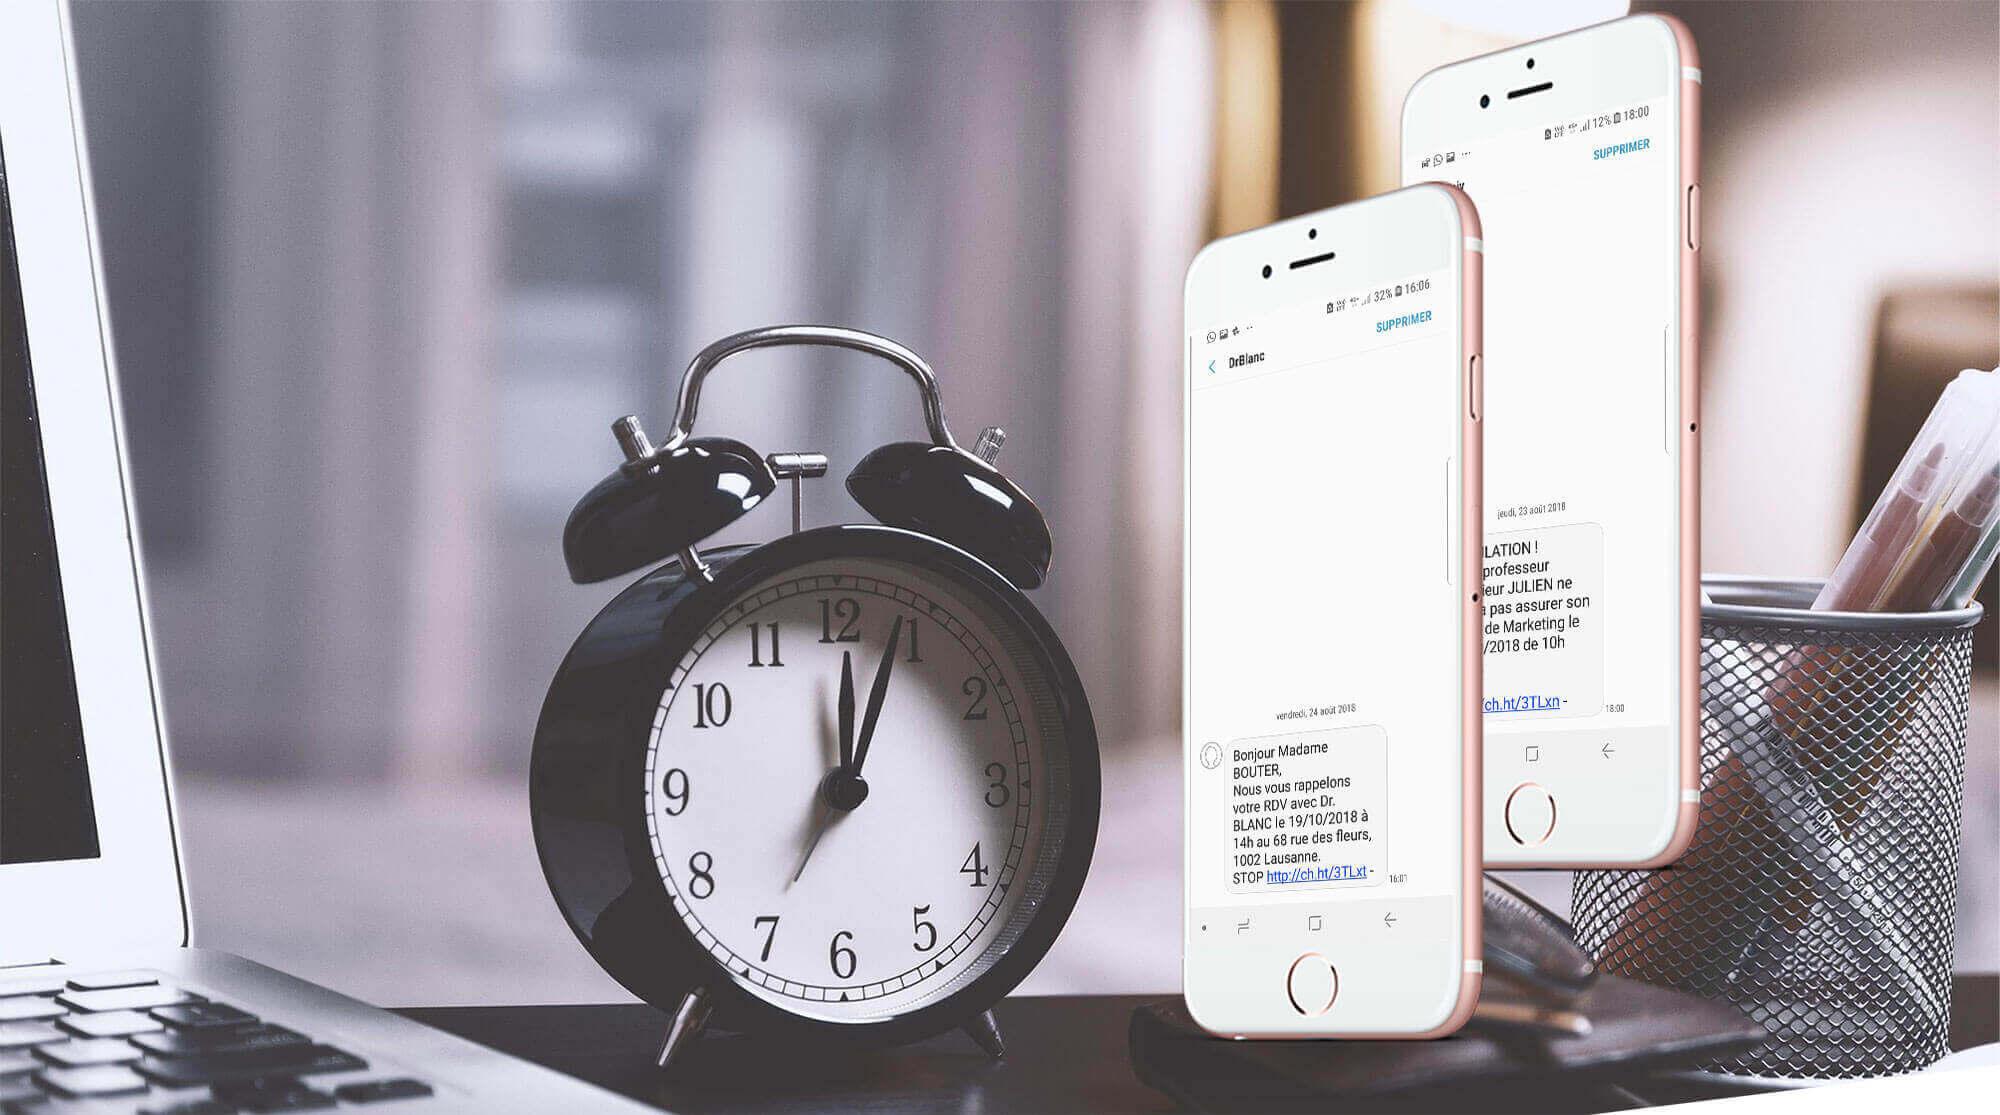 Le SMS Alerte avec SMSup